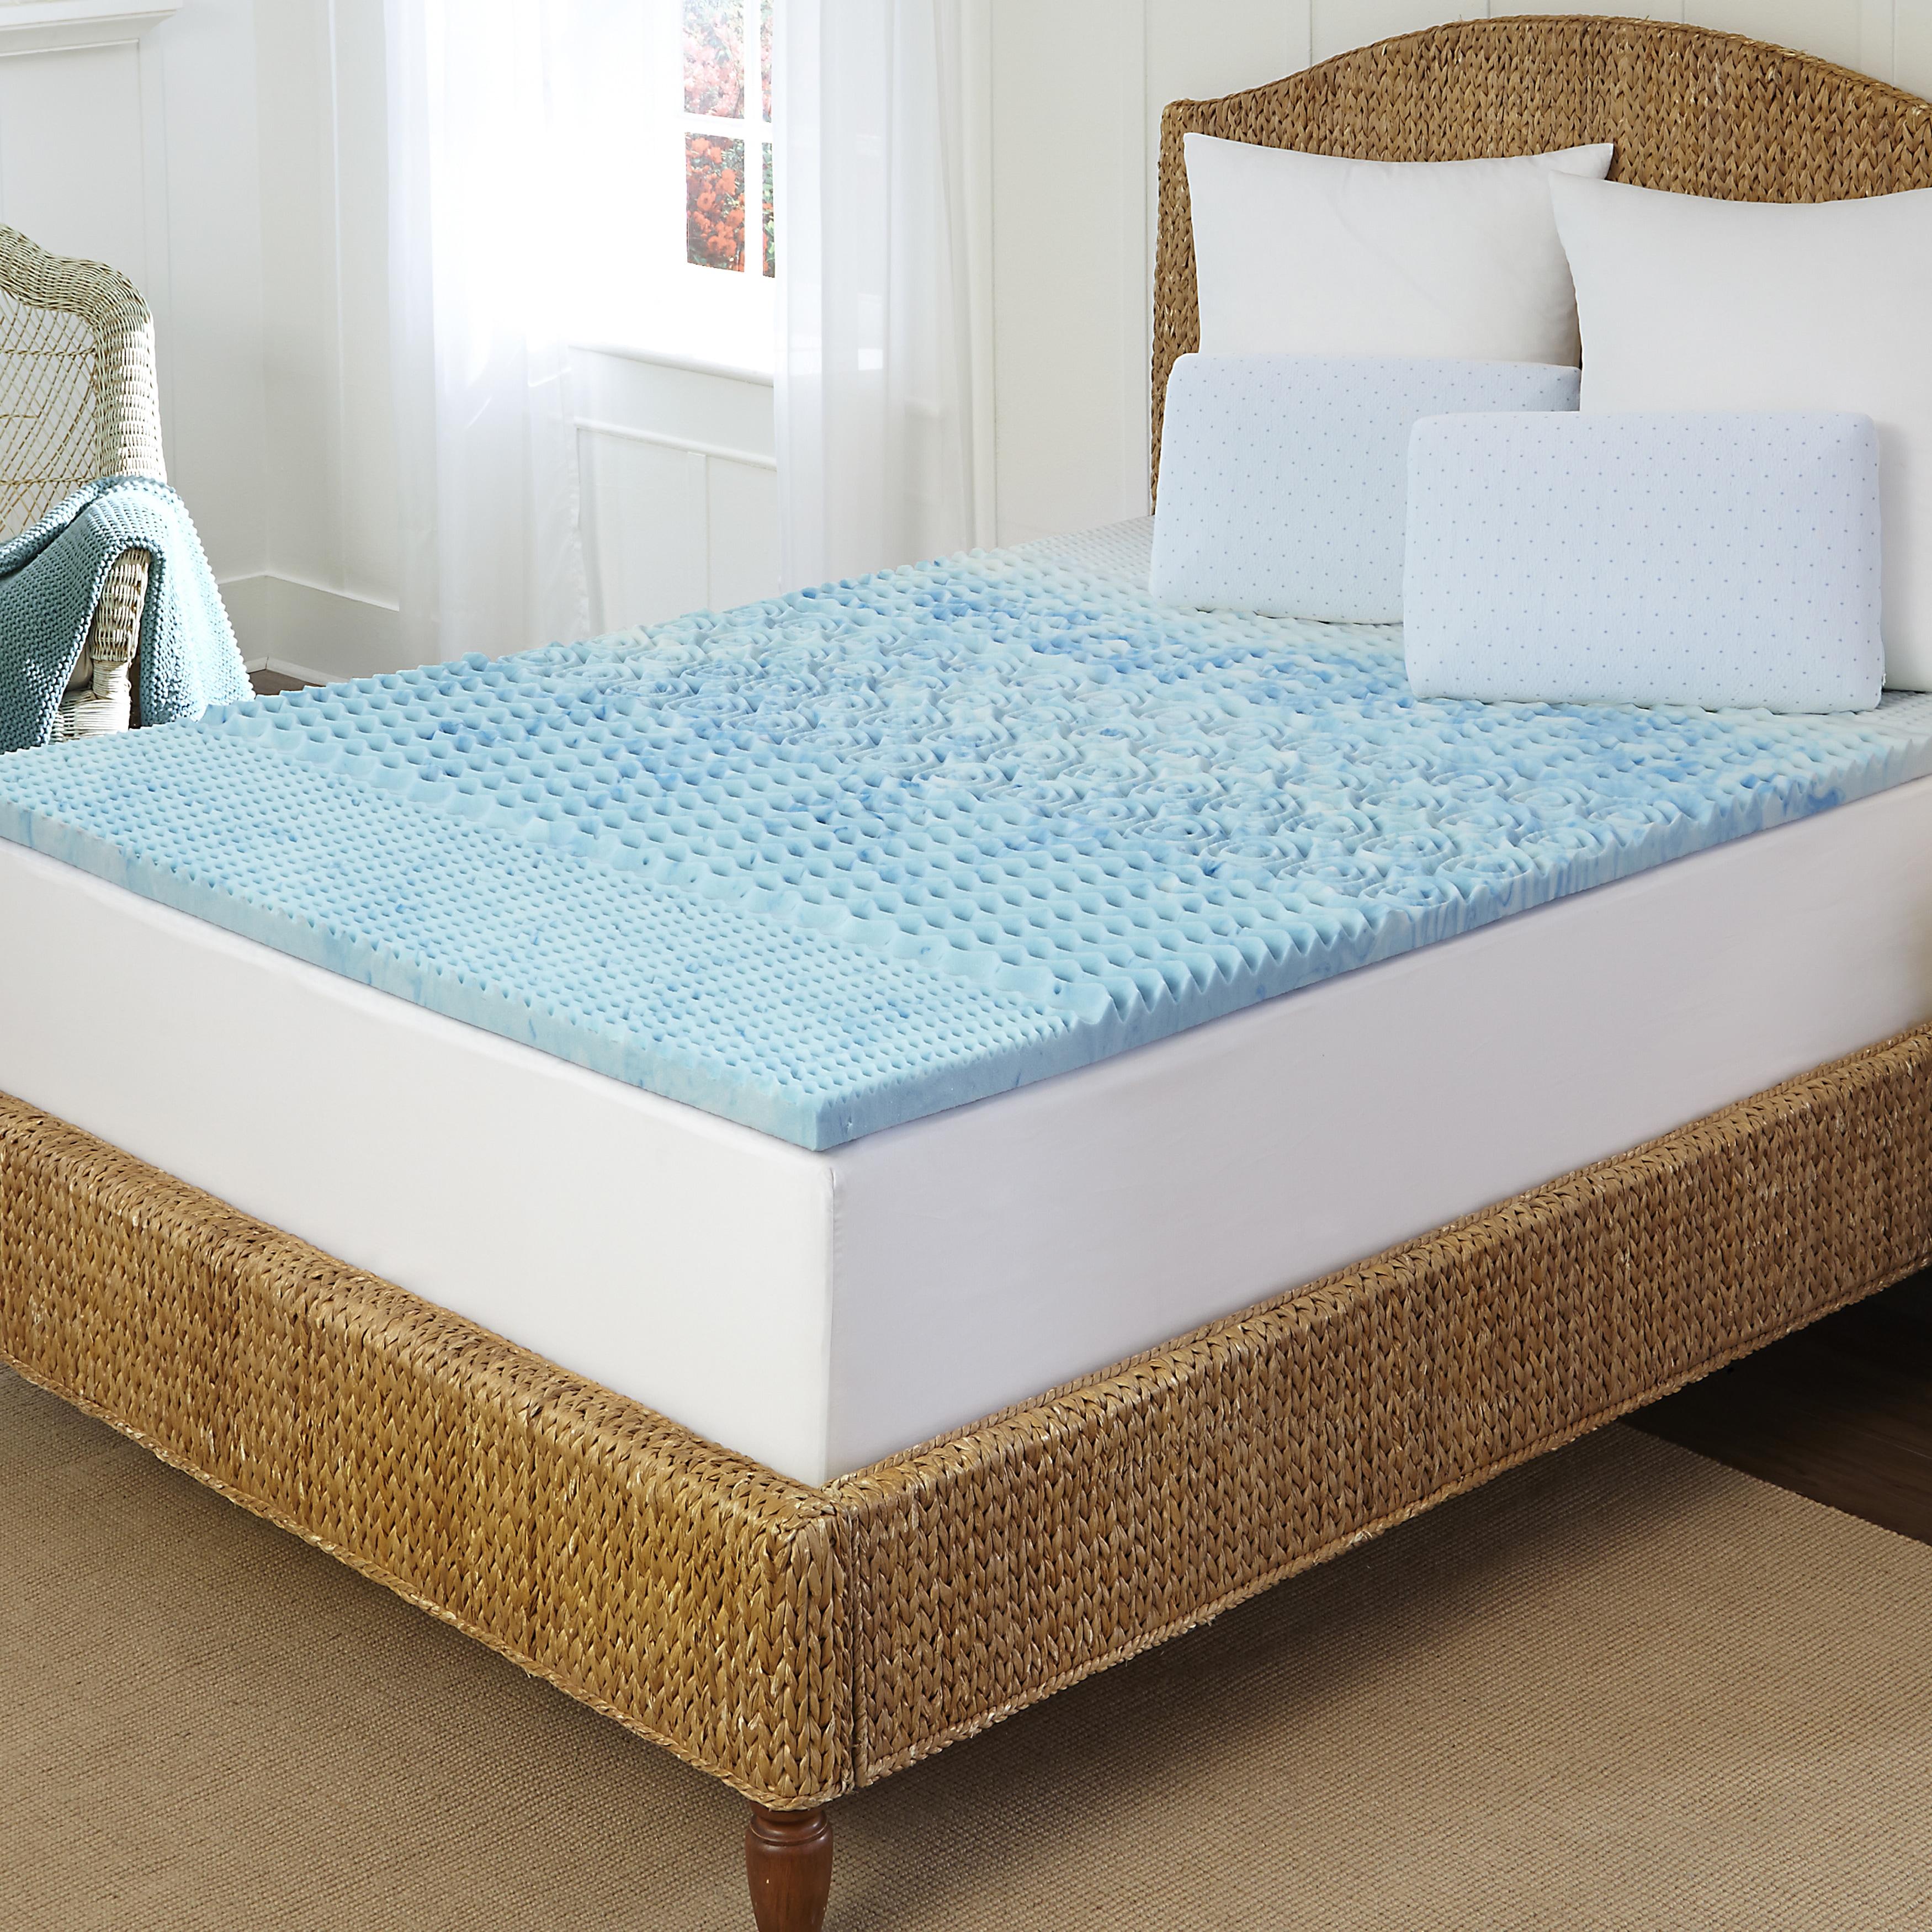 Arctic Sleep Marbleized 5-zone Gel Memory Foam Topper - Free ...